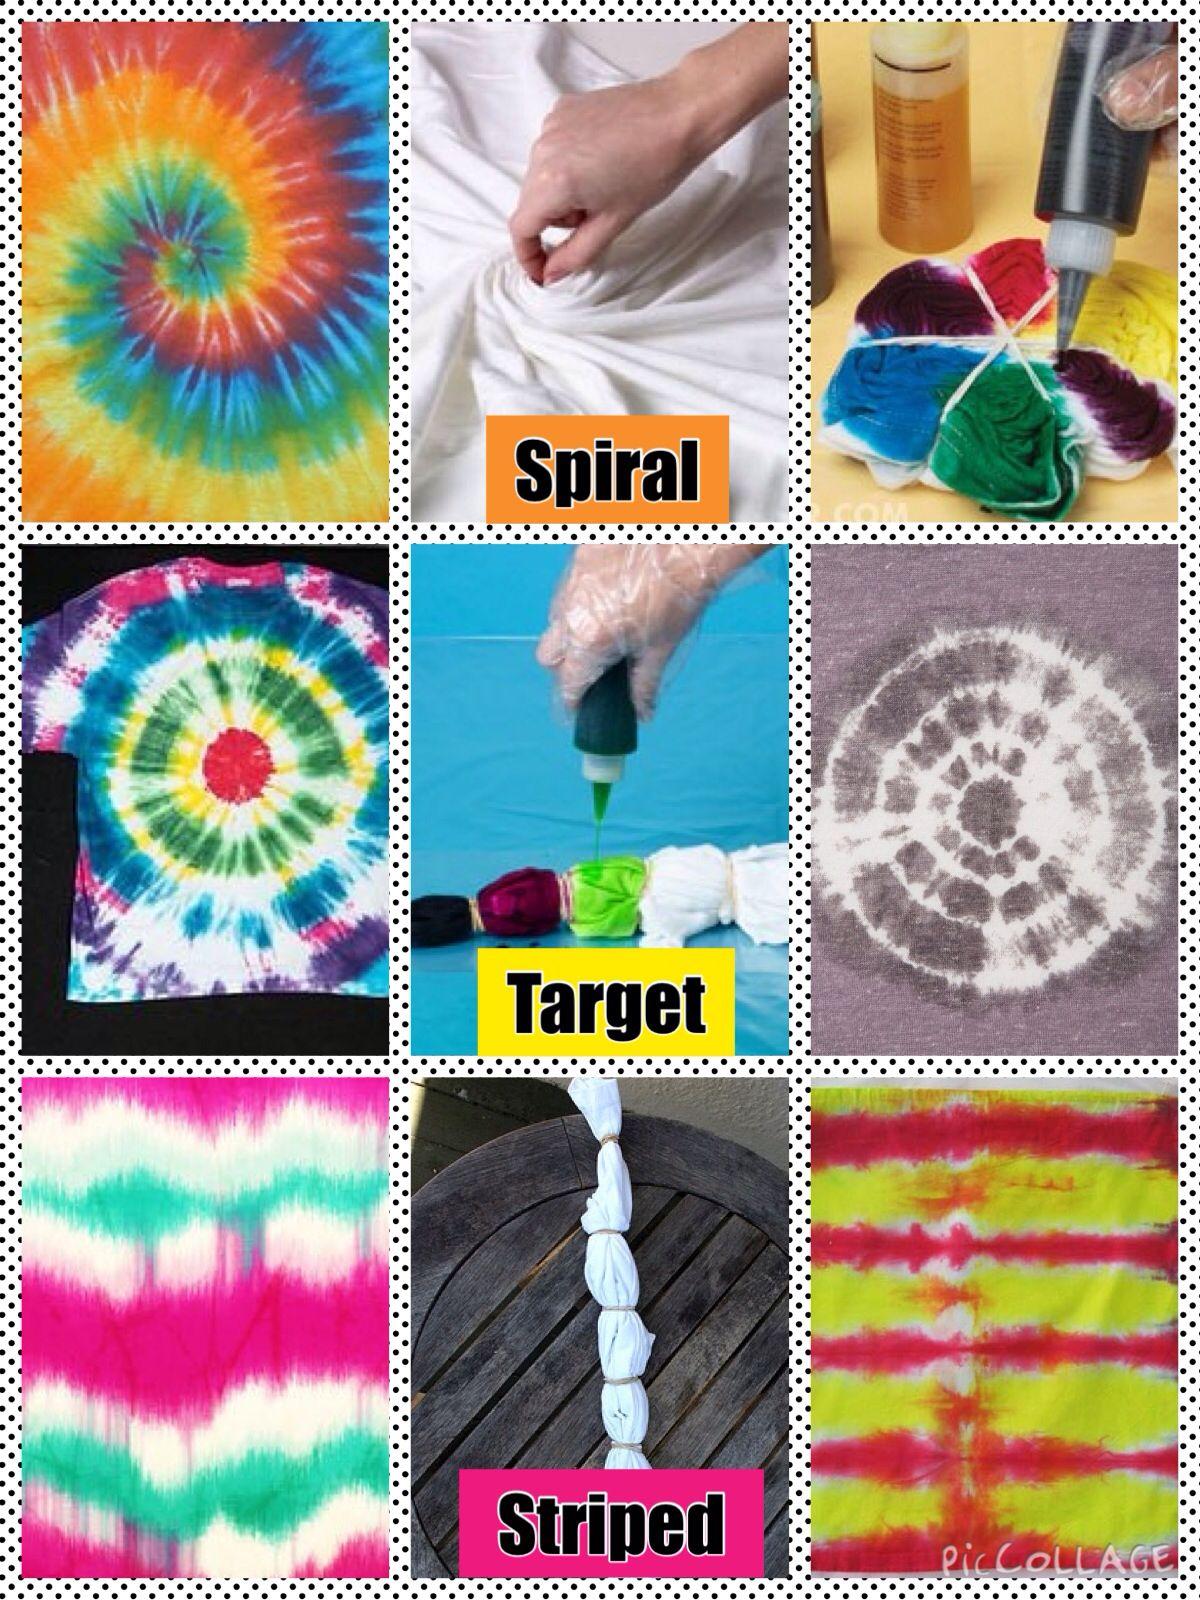 техника росписи ткани тай дай